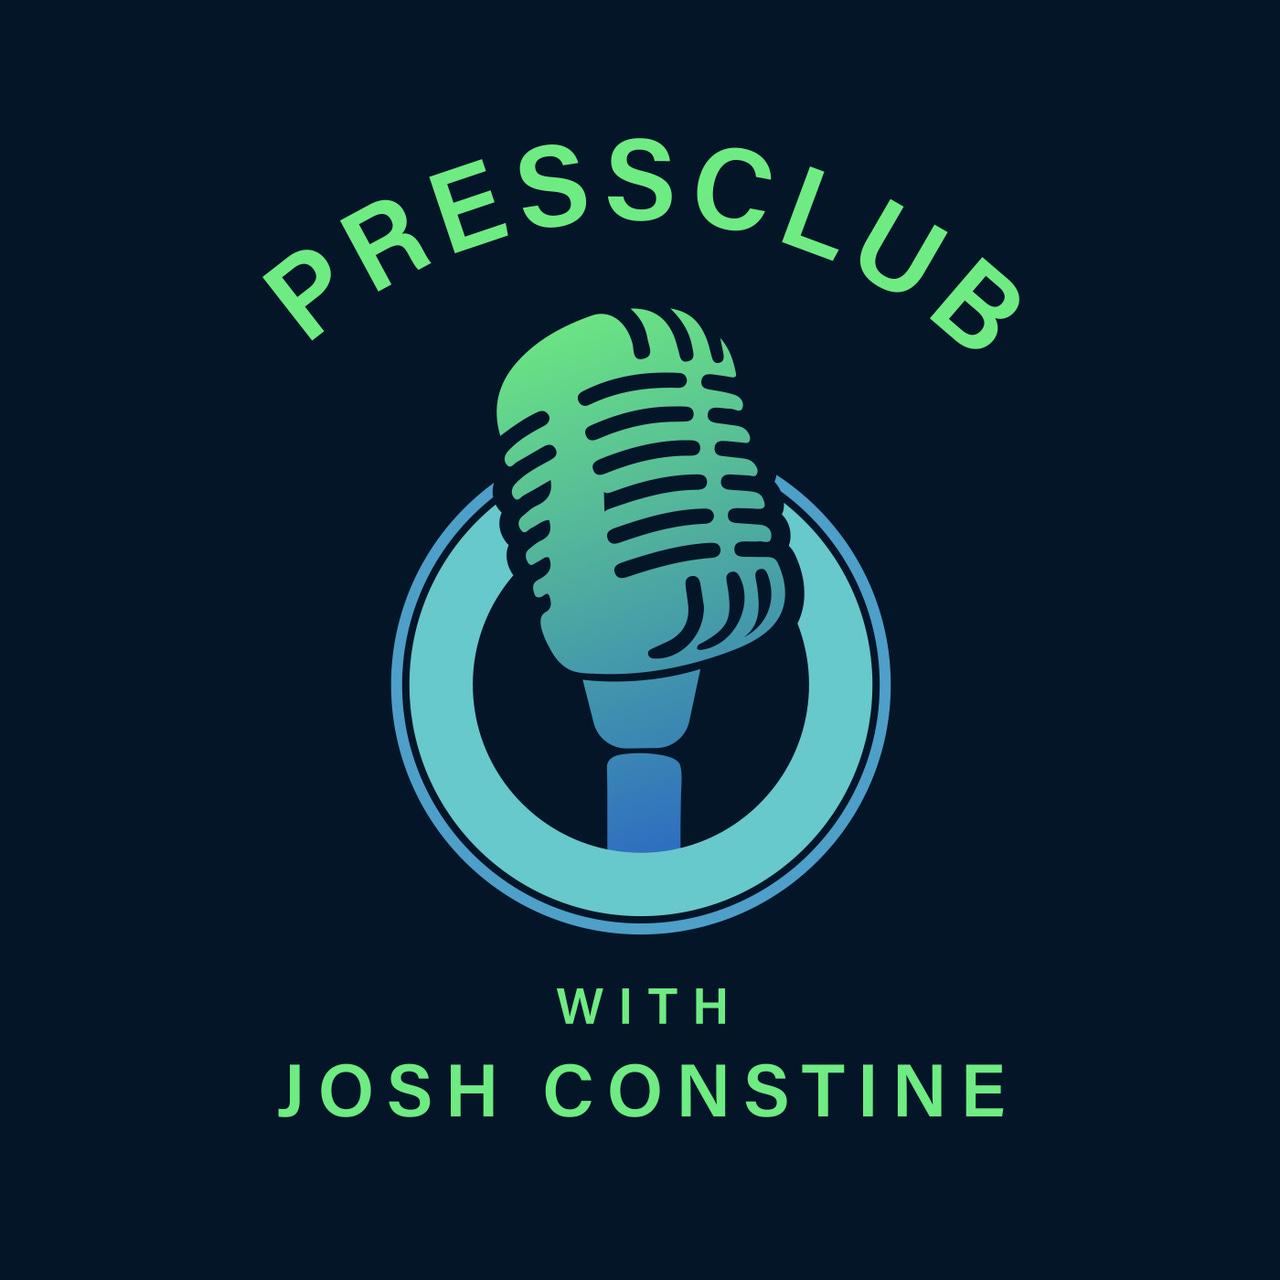 Josh Constine's PressClub